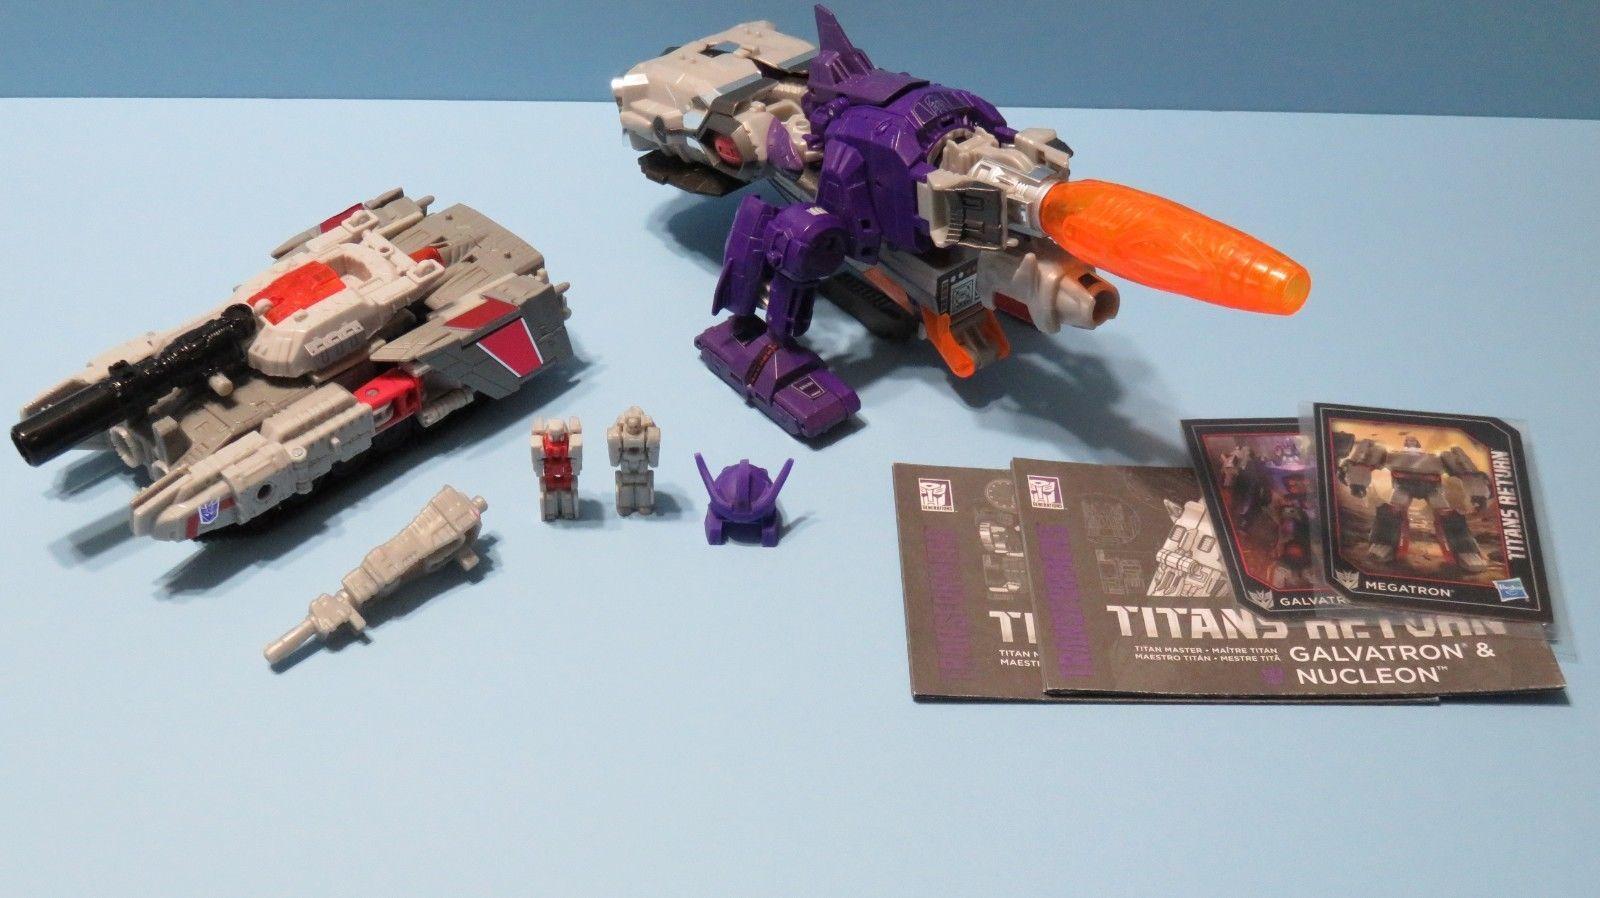 Hasbro Autobots Spaceship Megatron Transformers Prime No Box Movie Action Figure